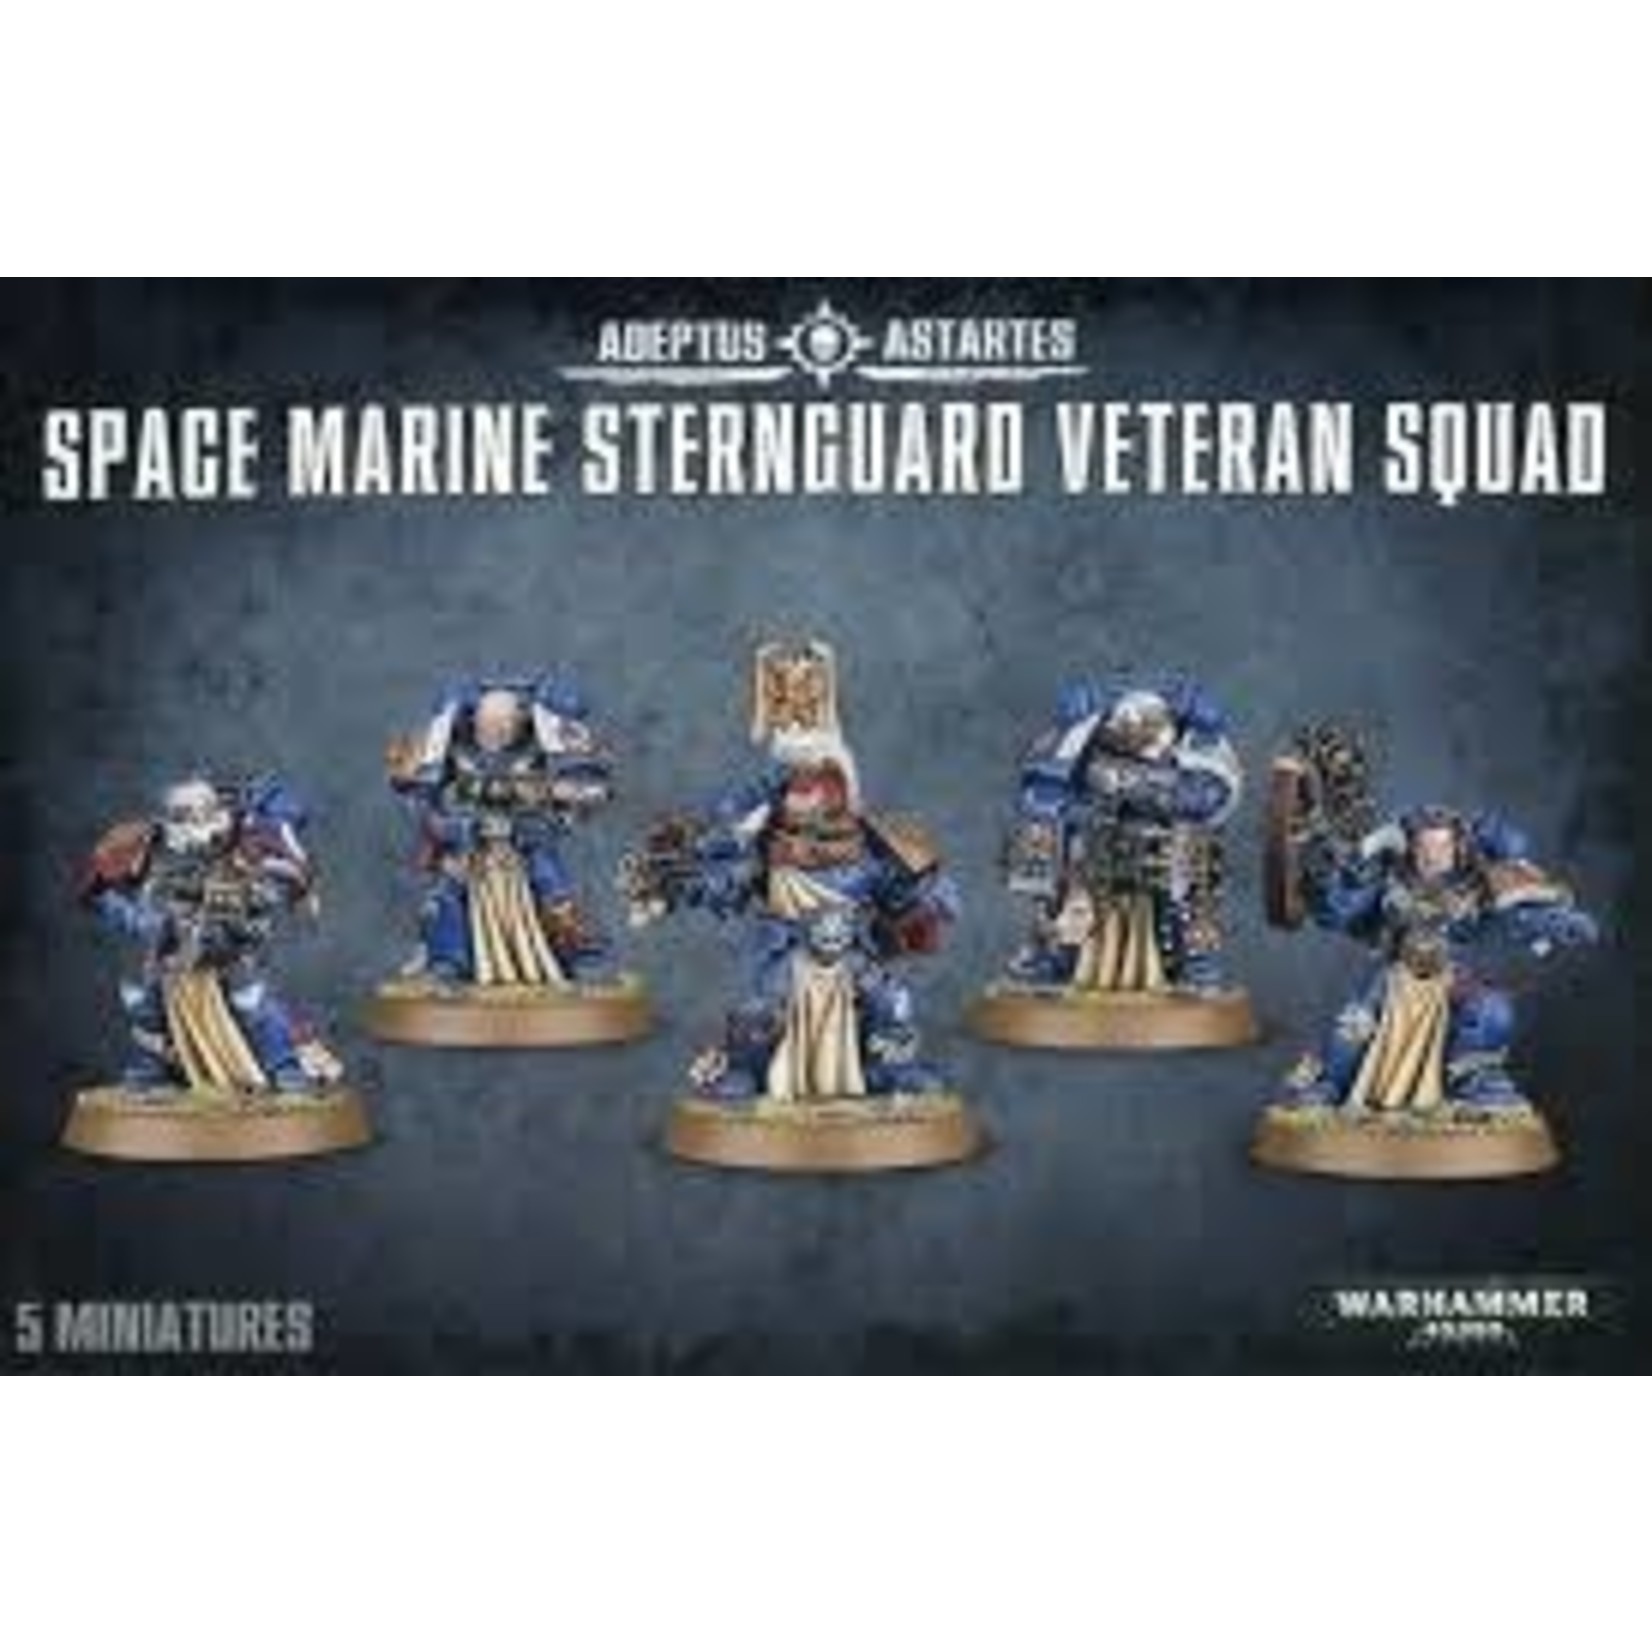 Space Marine Sternguard Veteran Guard (40K)